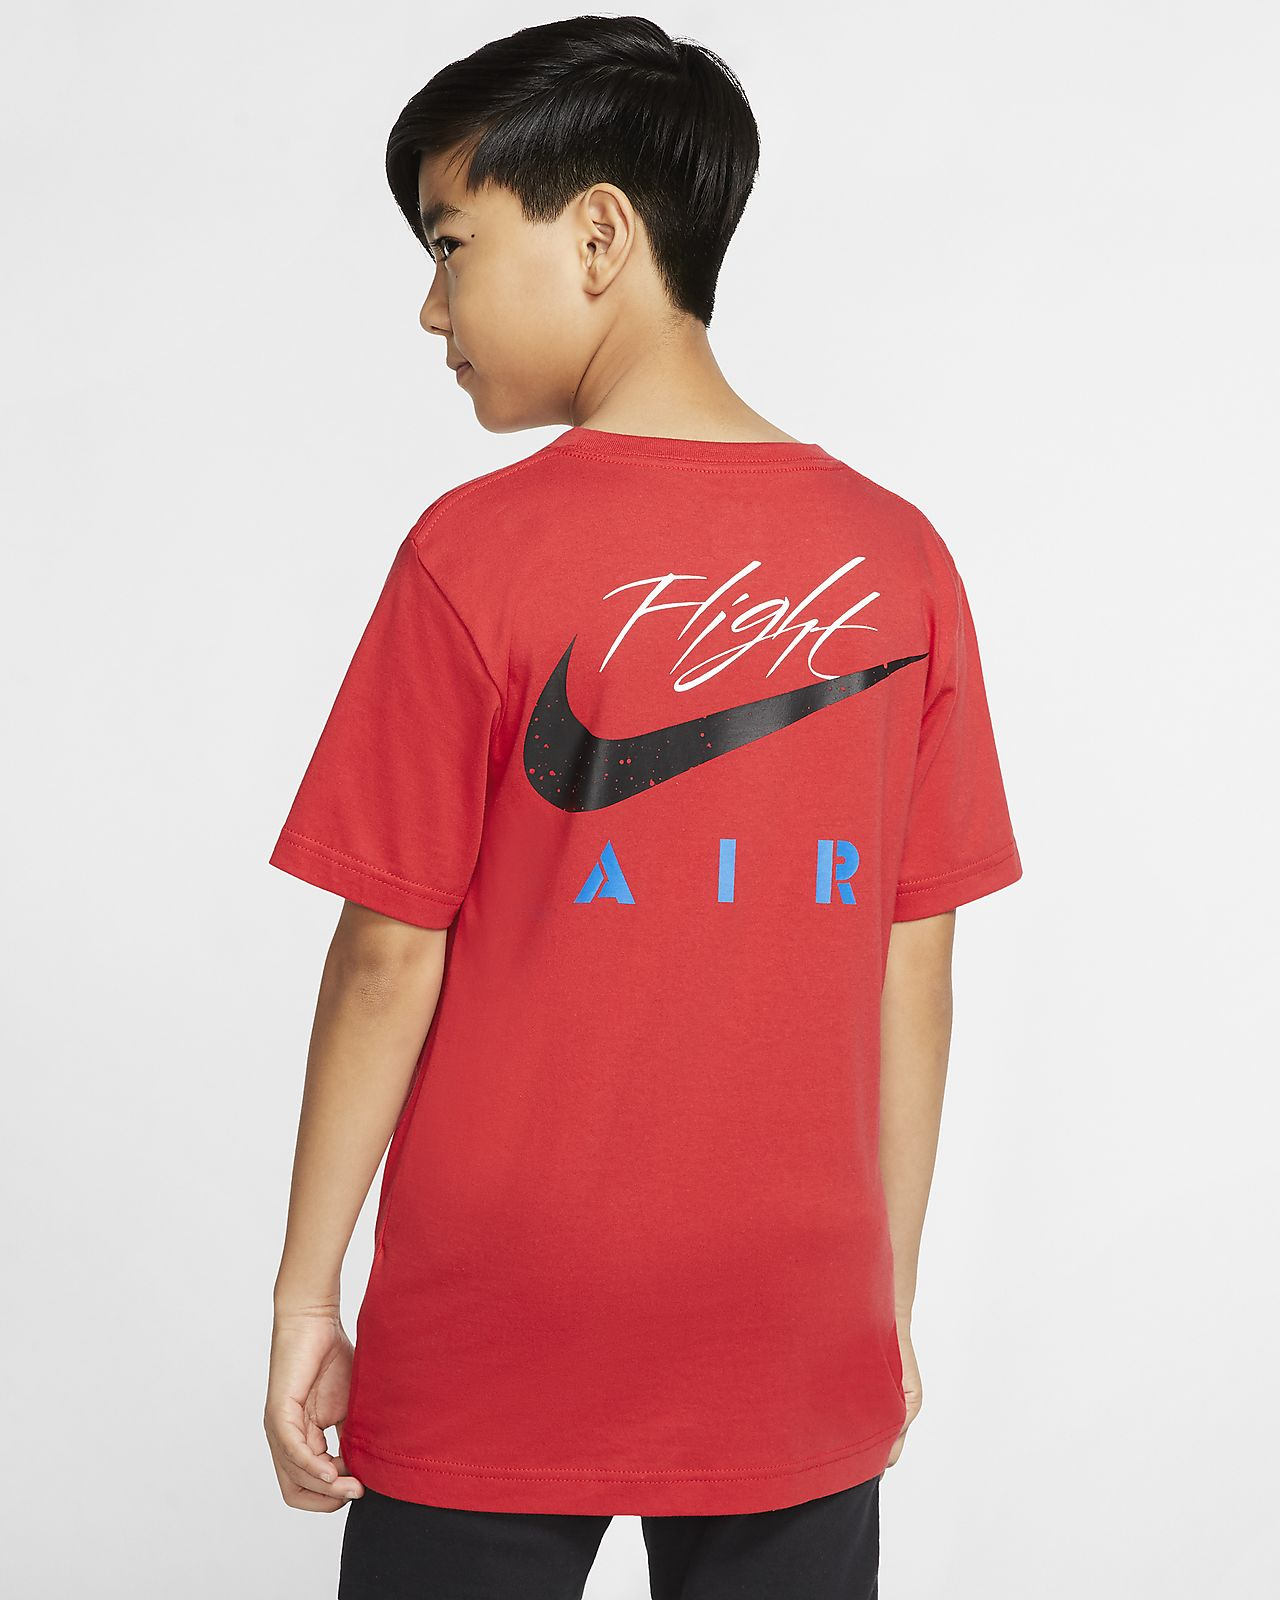 Air Jordan Older Kids' (Boys') Short Sleeve T Shirt